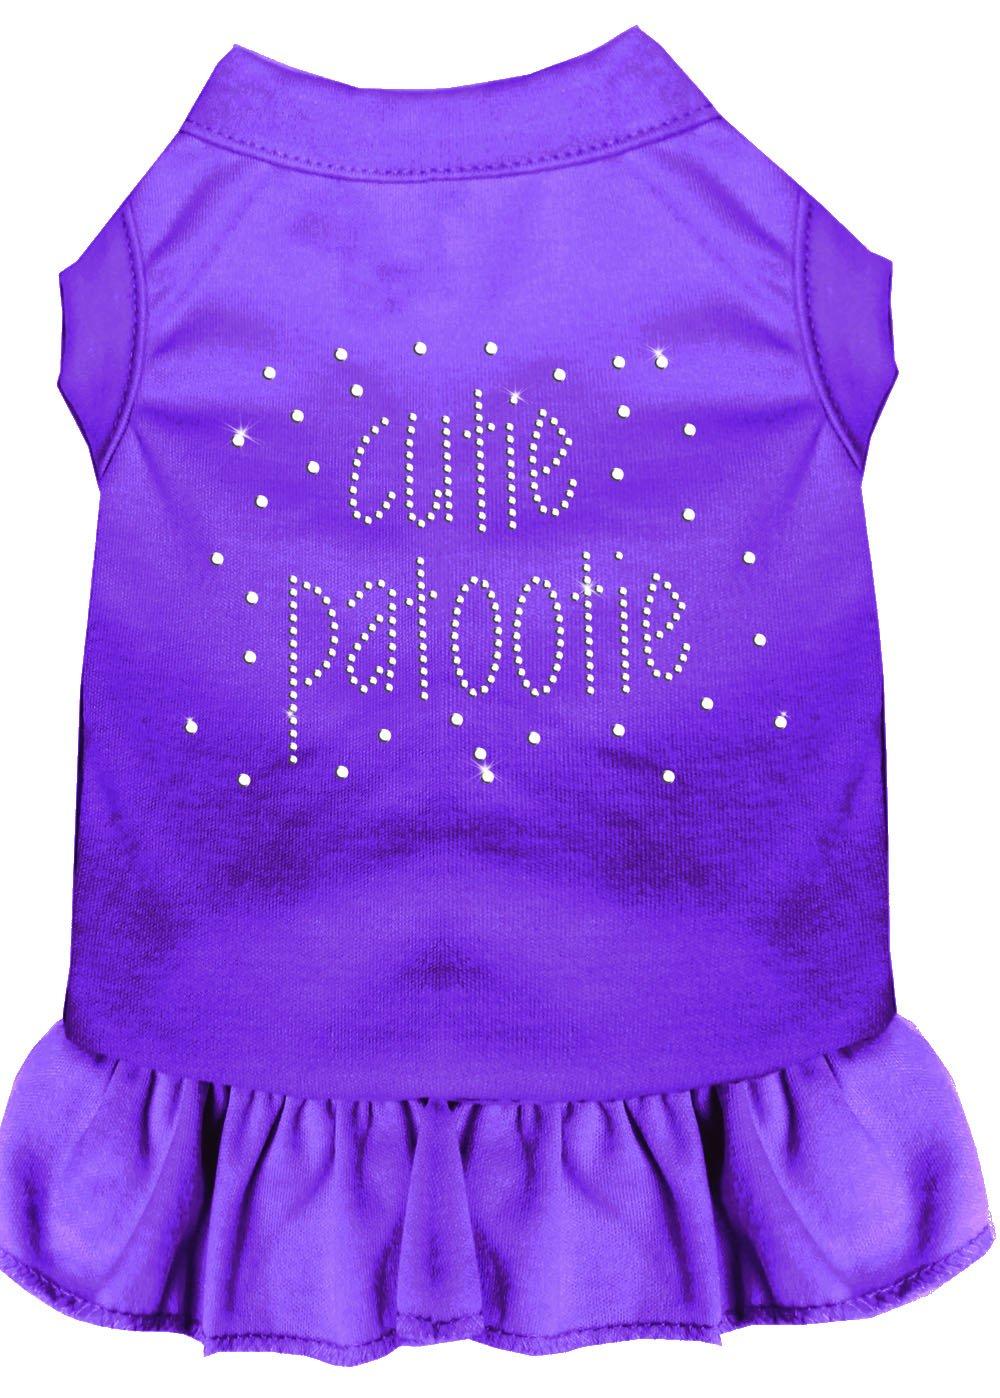 Mirage Pet Products Rhinestone Cutie Patootie Dress, Small, Purple